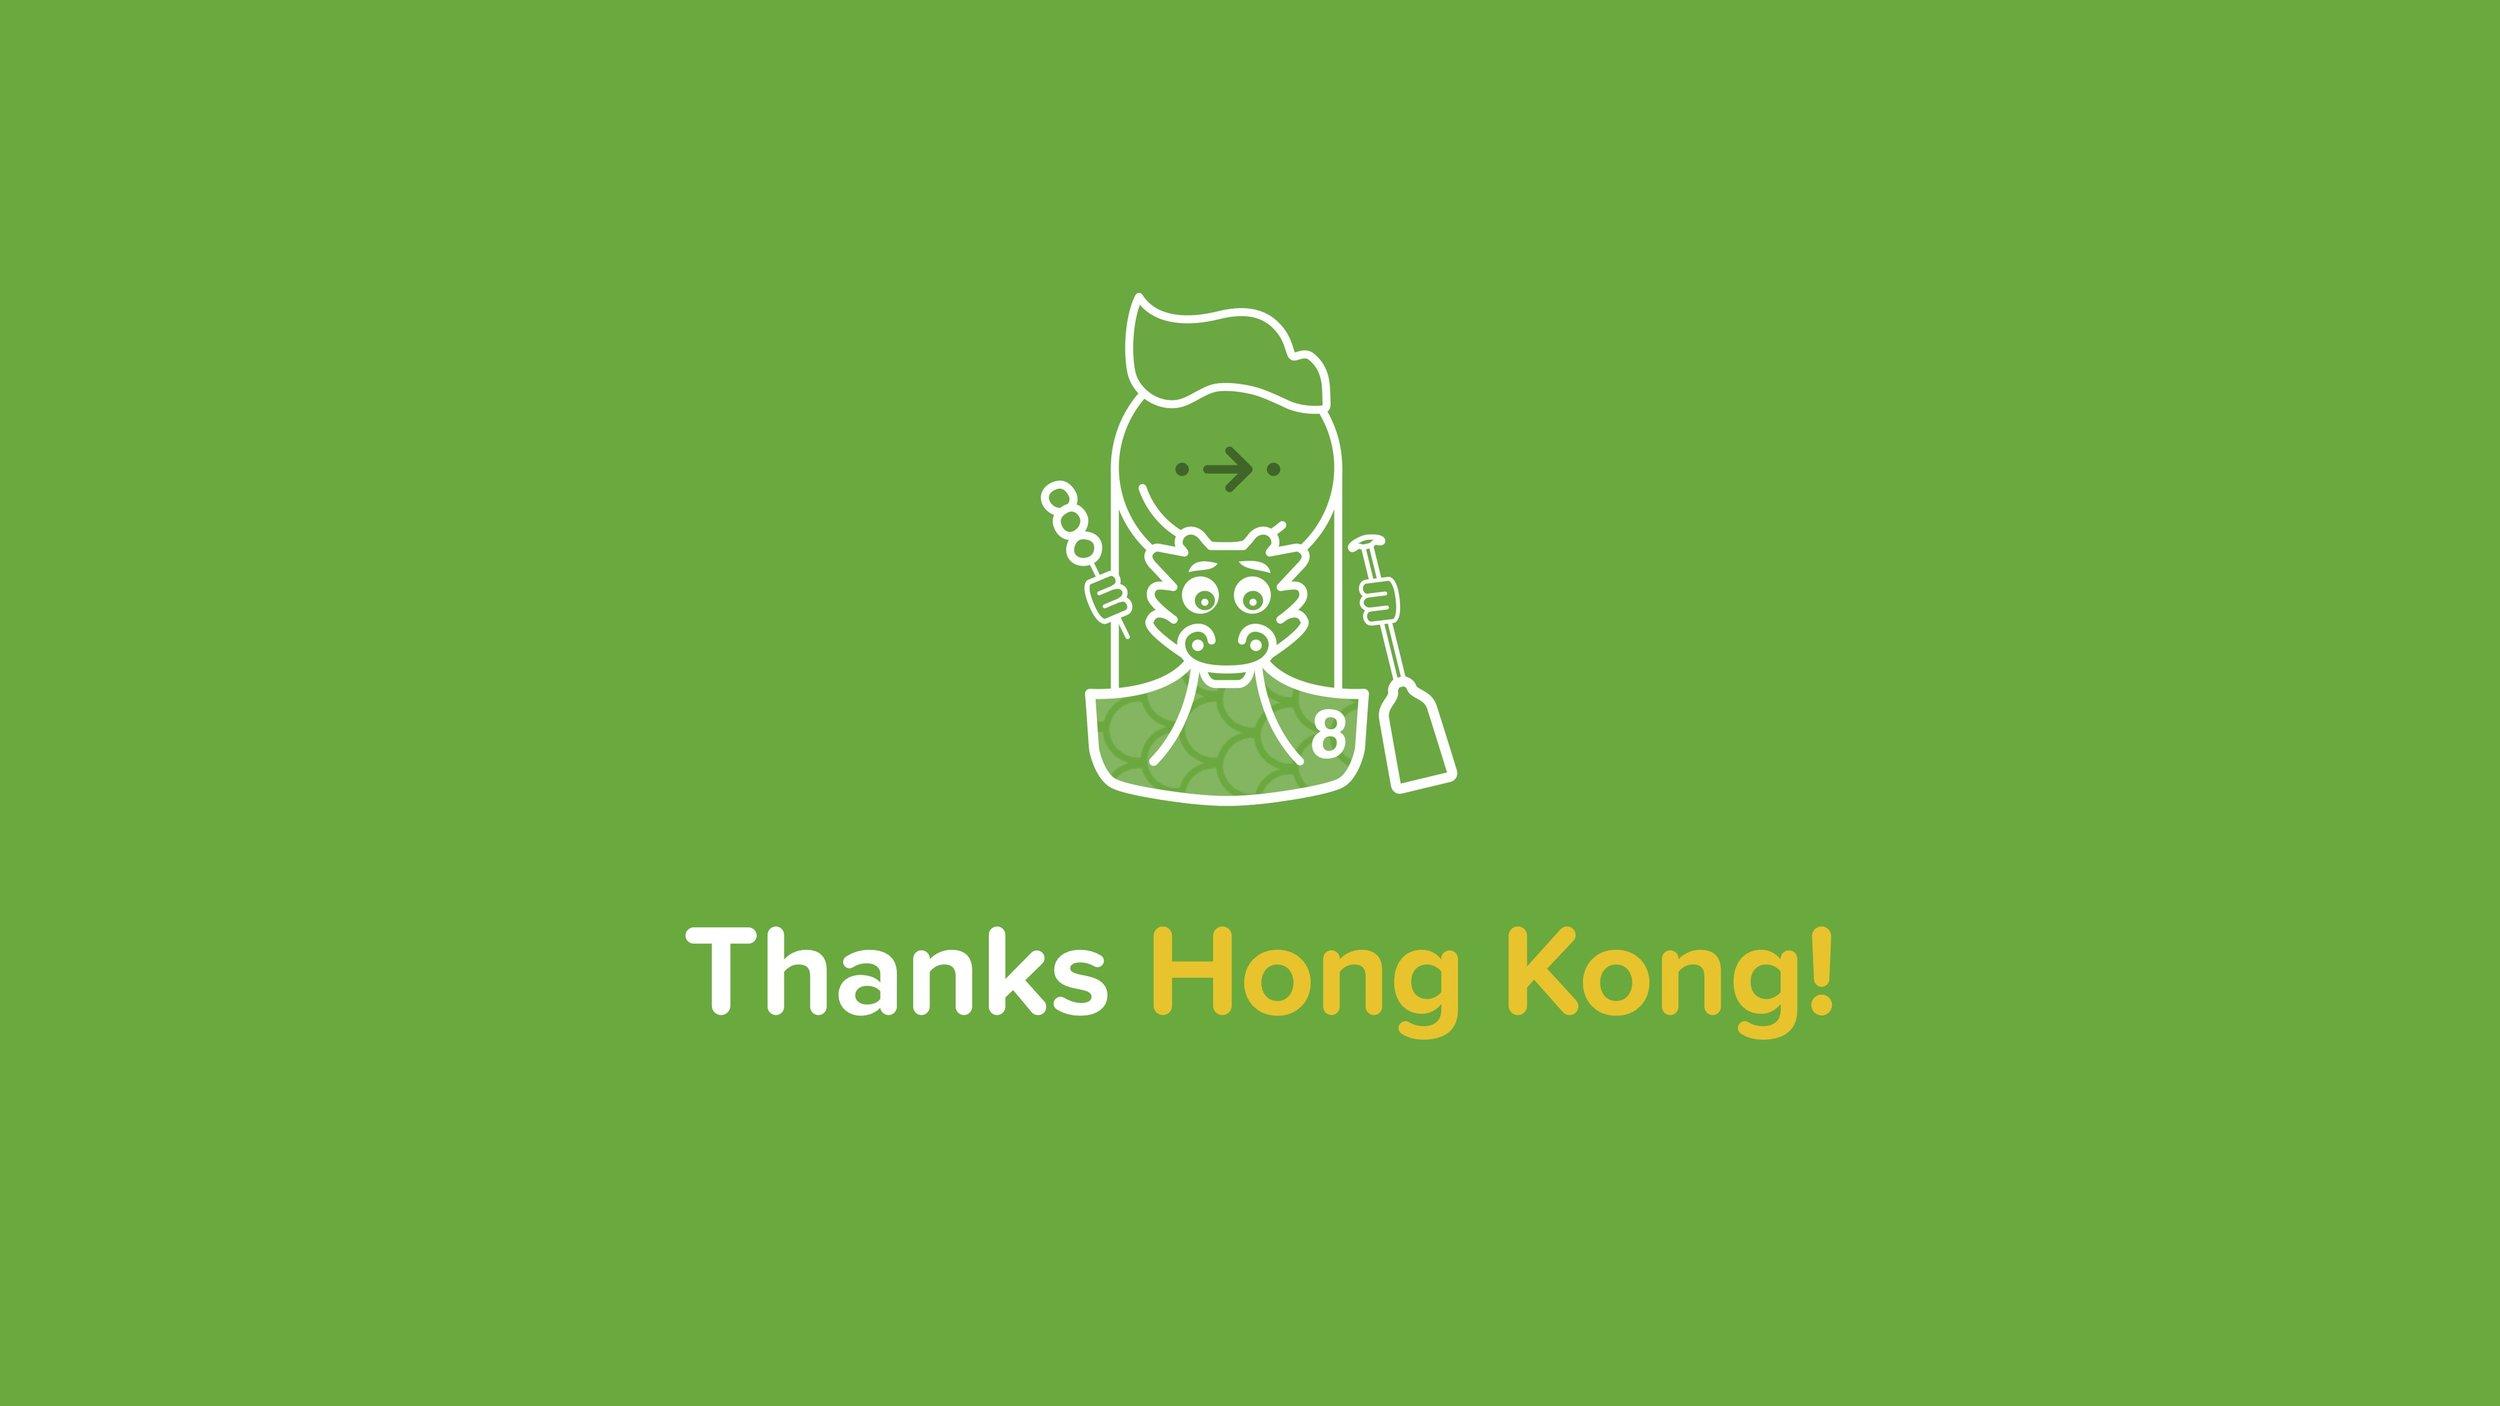 HK_Design 35.jpg